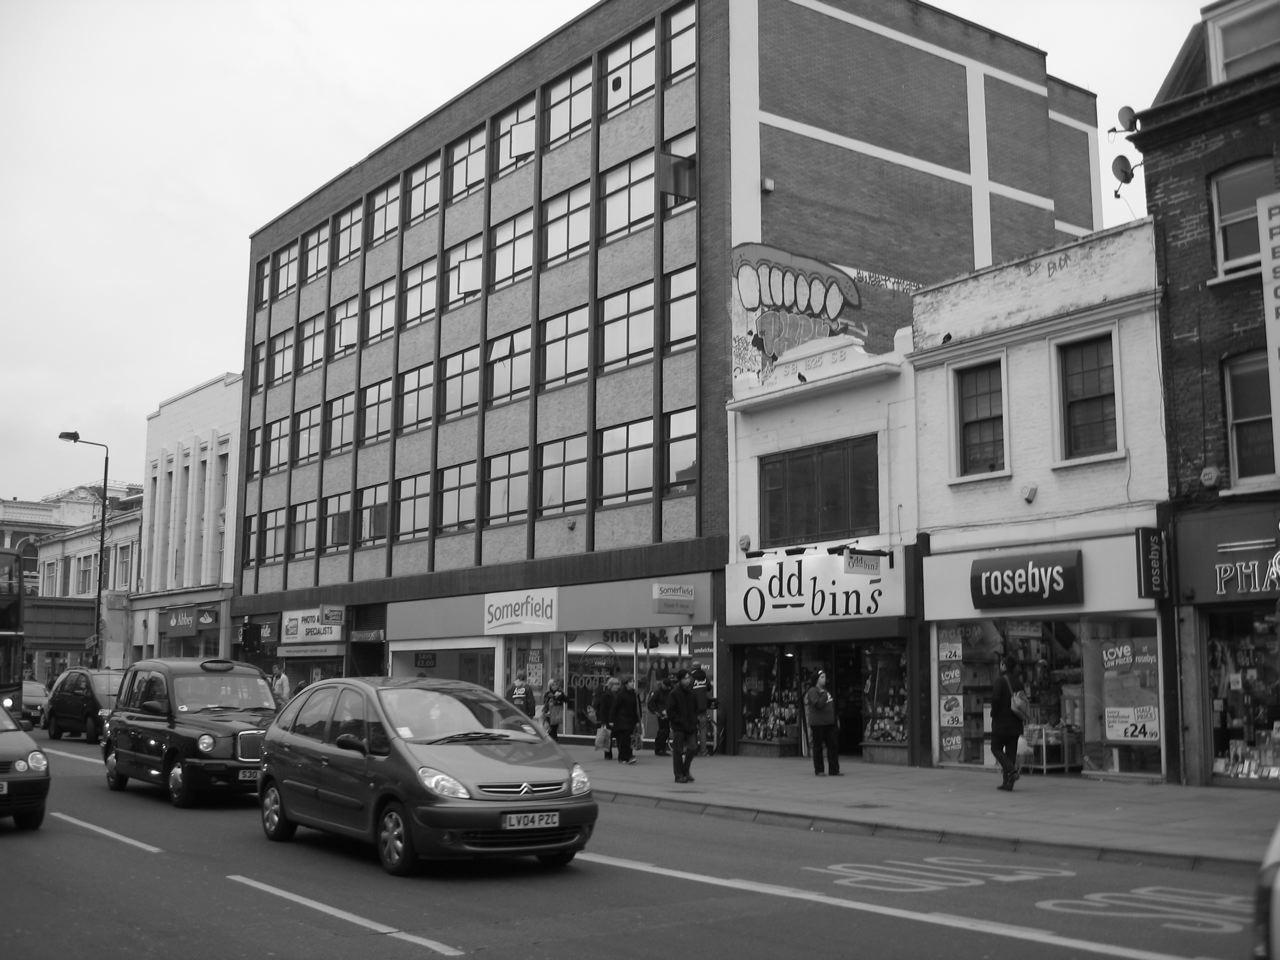 Funeral Homes Camden Town Uk